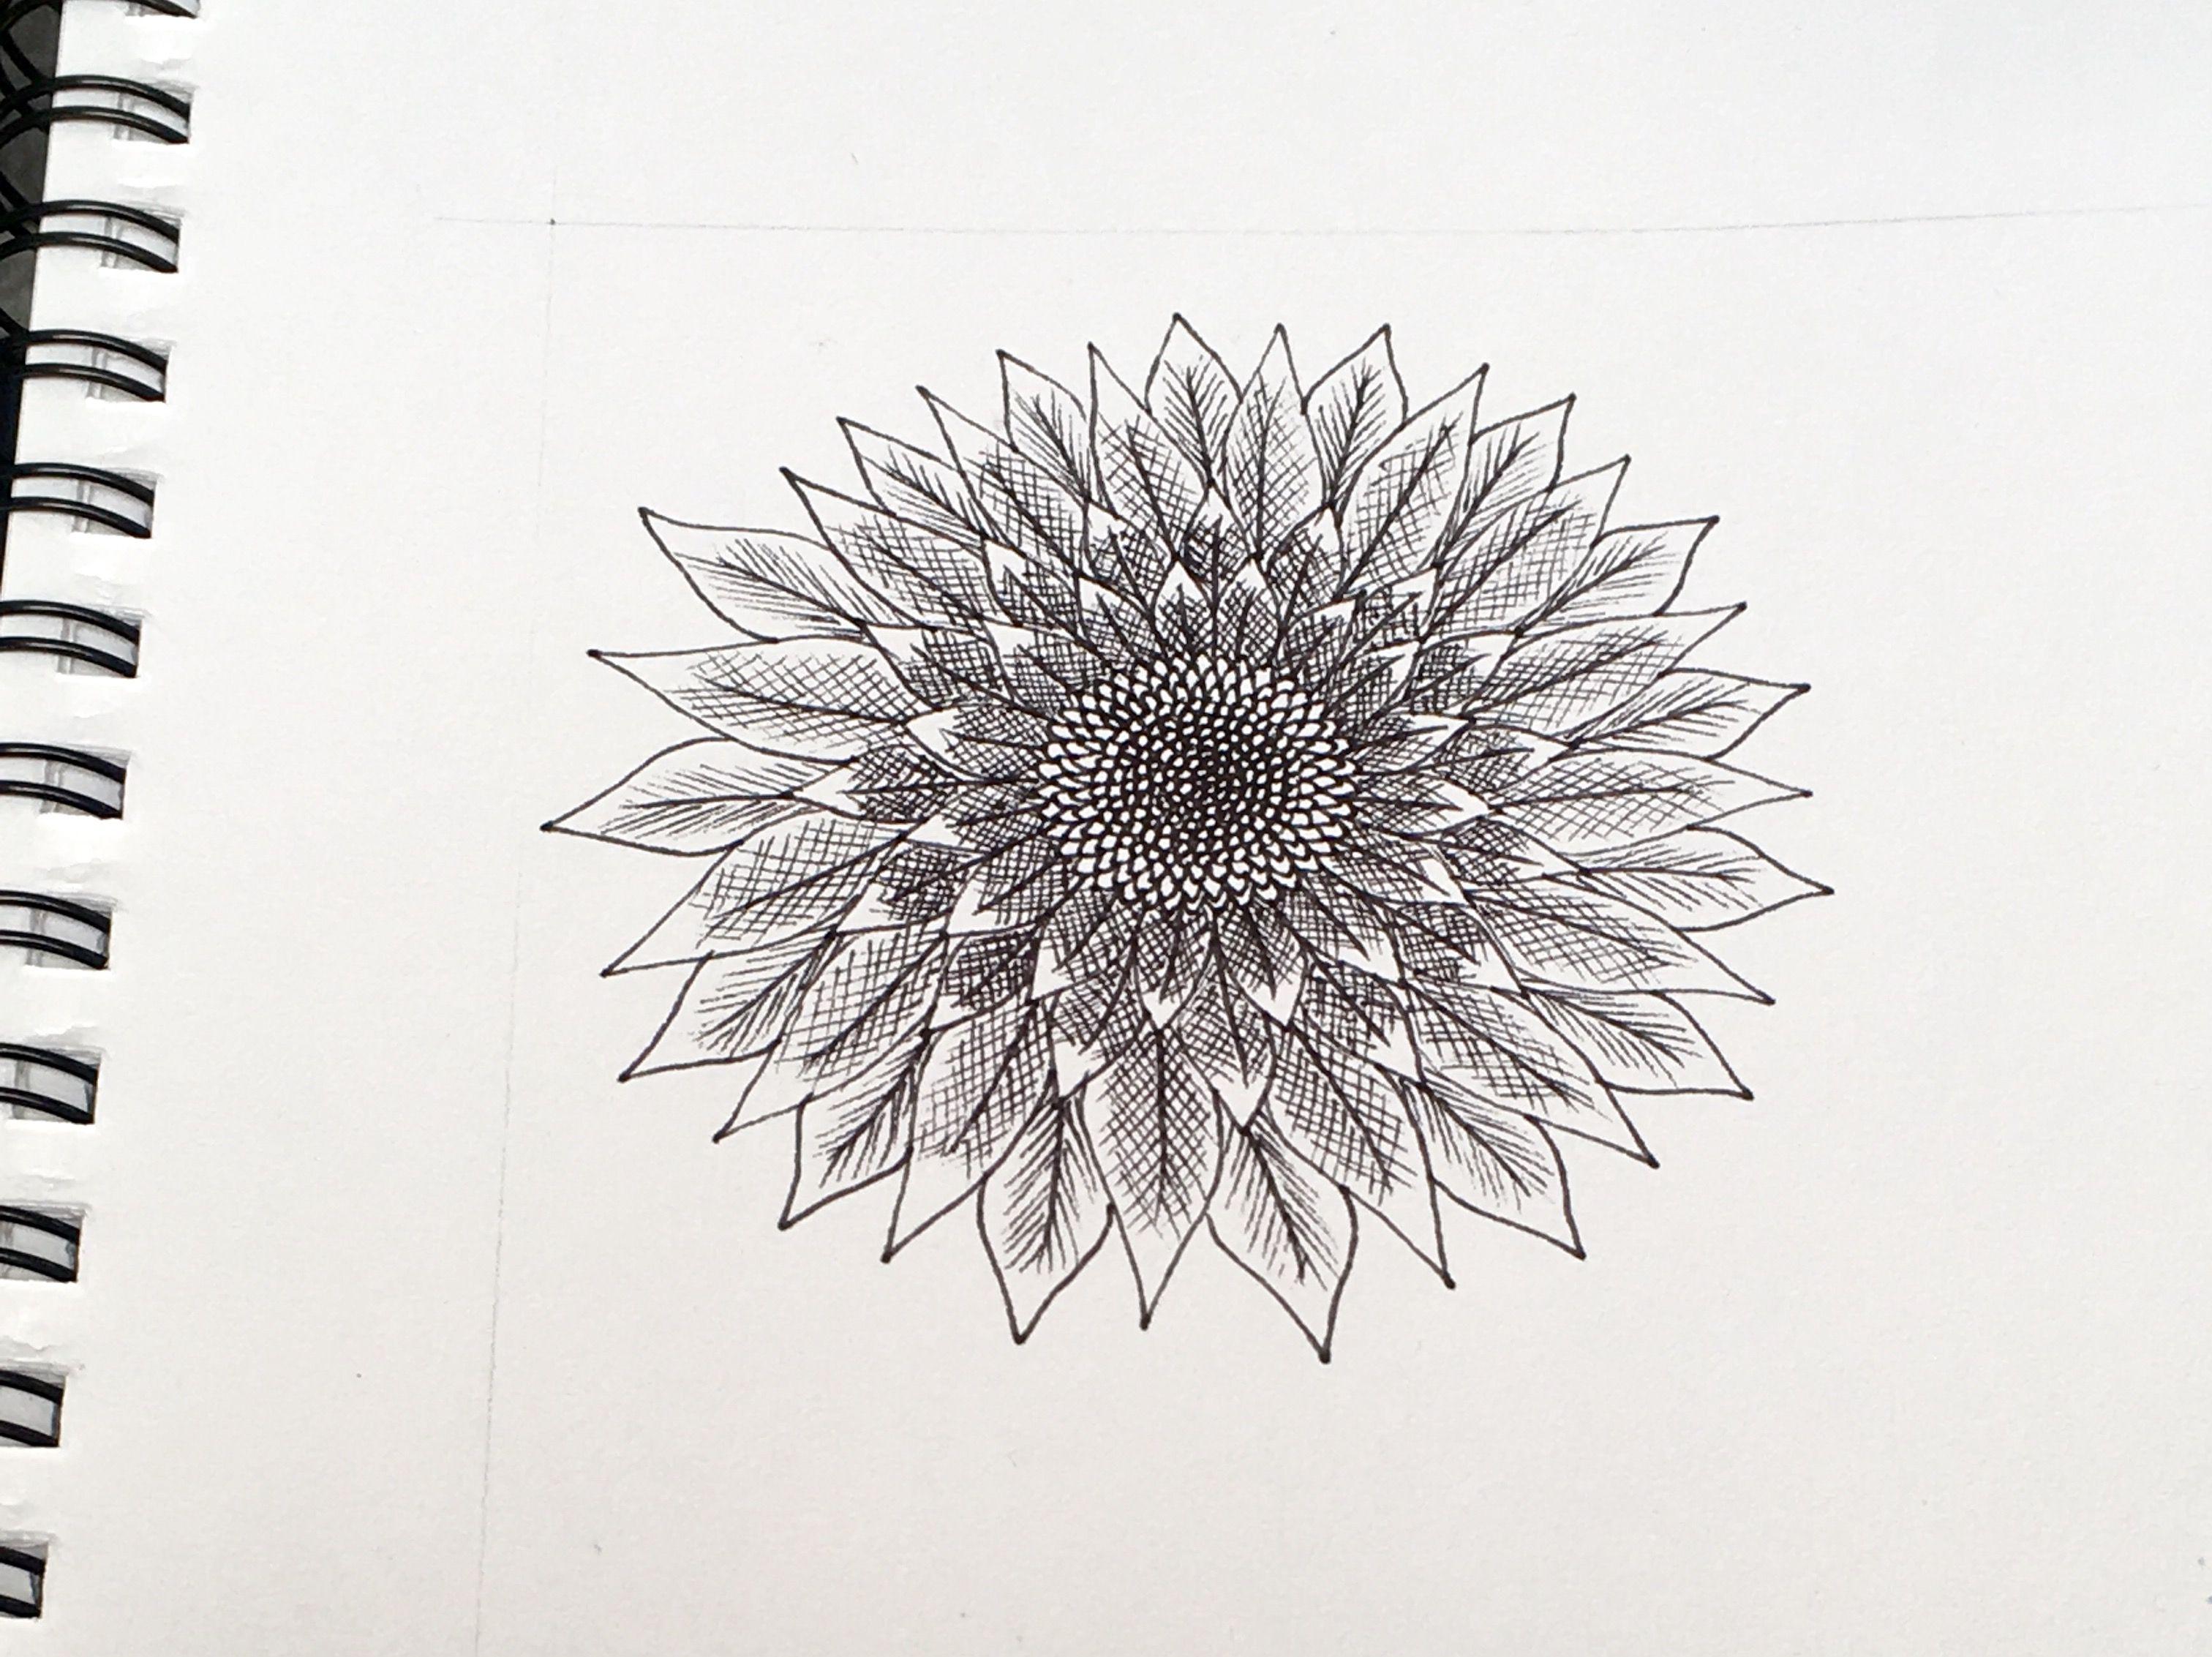 Sunflower Line Drawing : Sunflower doodle in progress 1 art pinterest